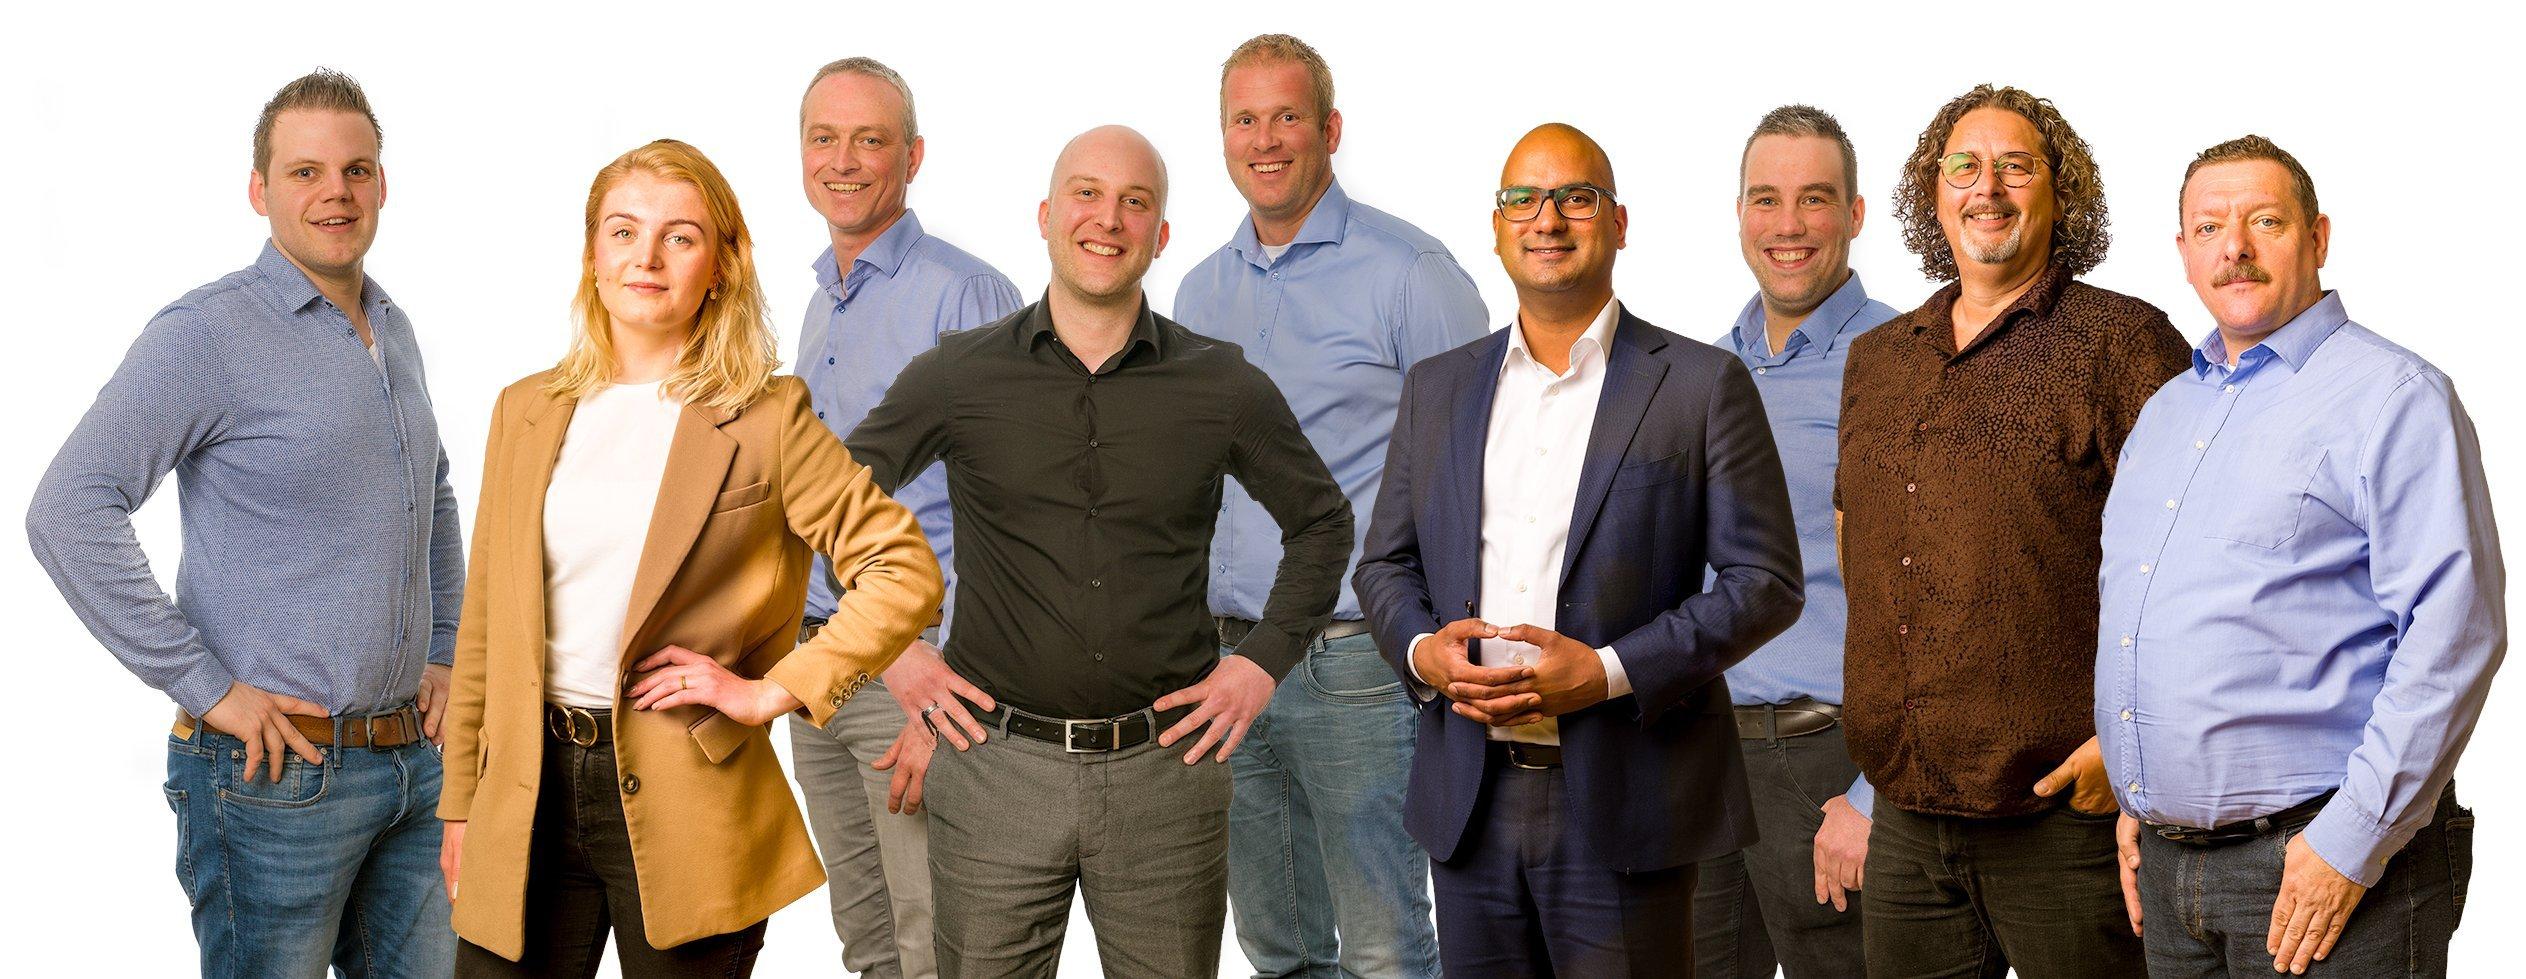 team TFF november 2019